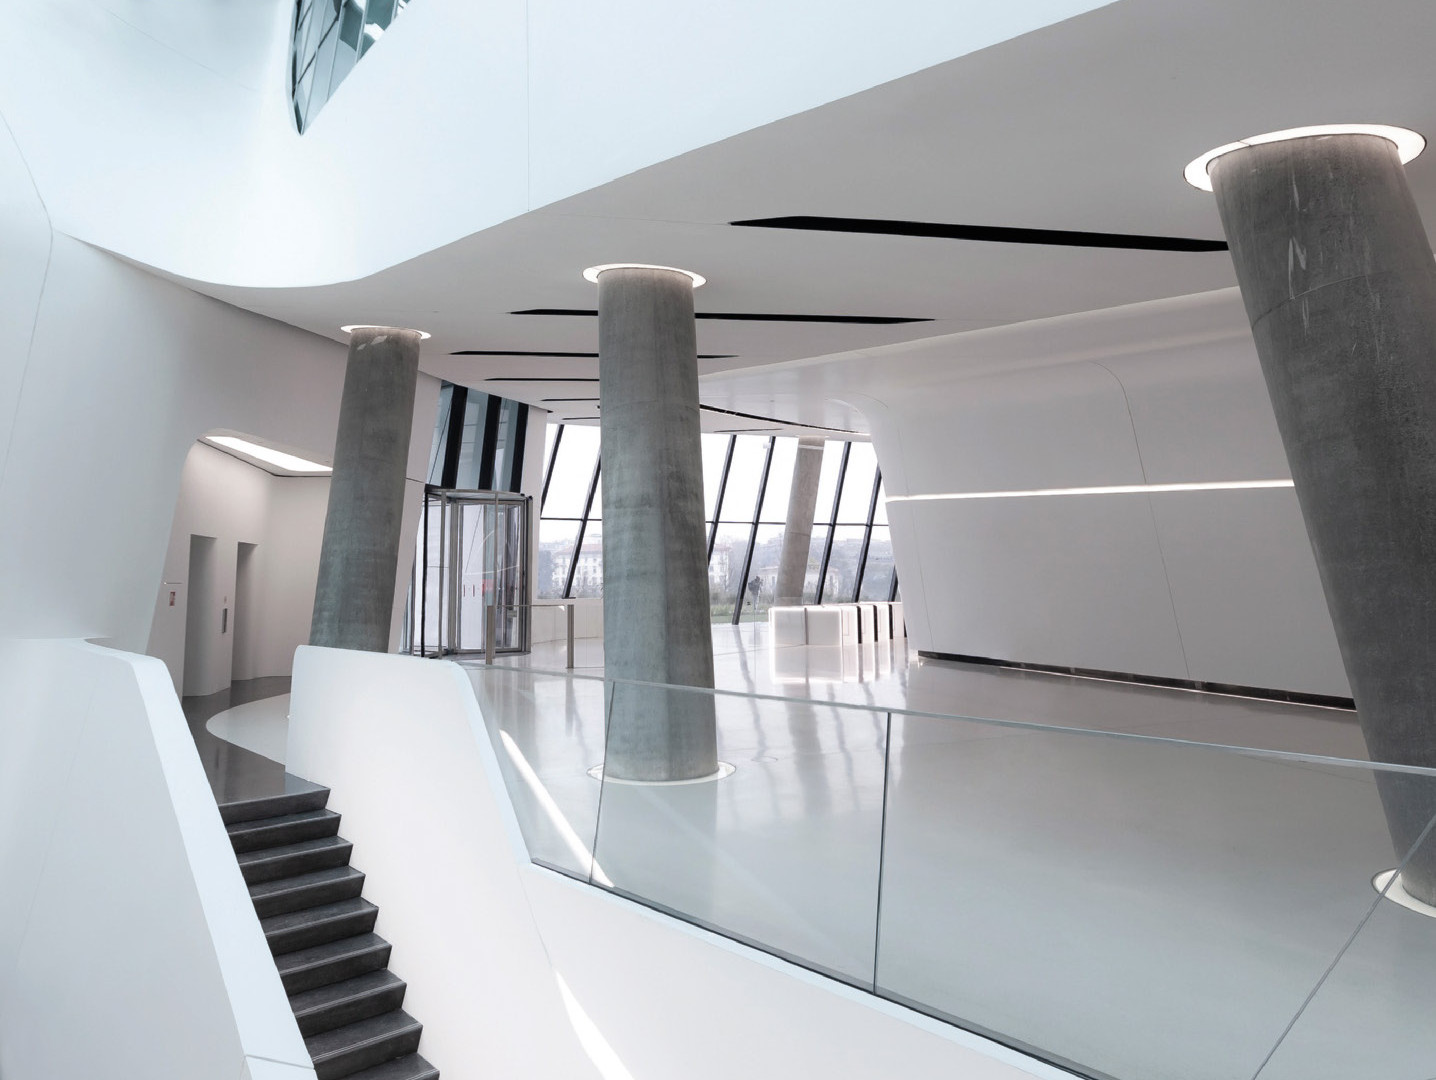 Torre Hadid - Hall ingresso 1 - Credits